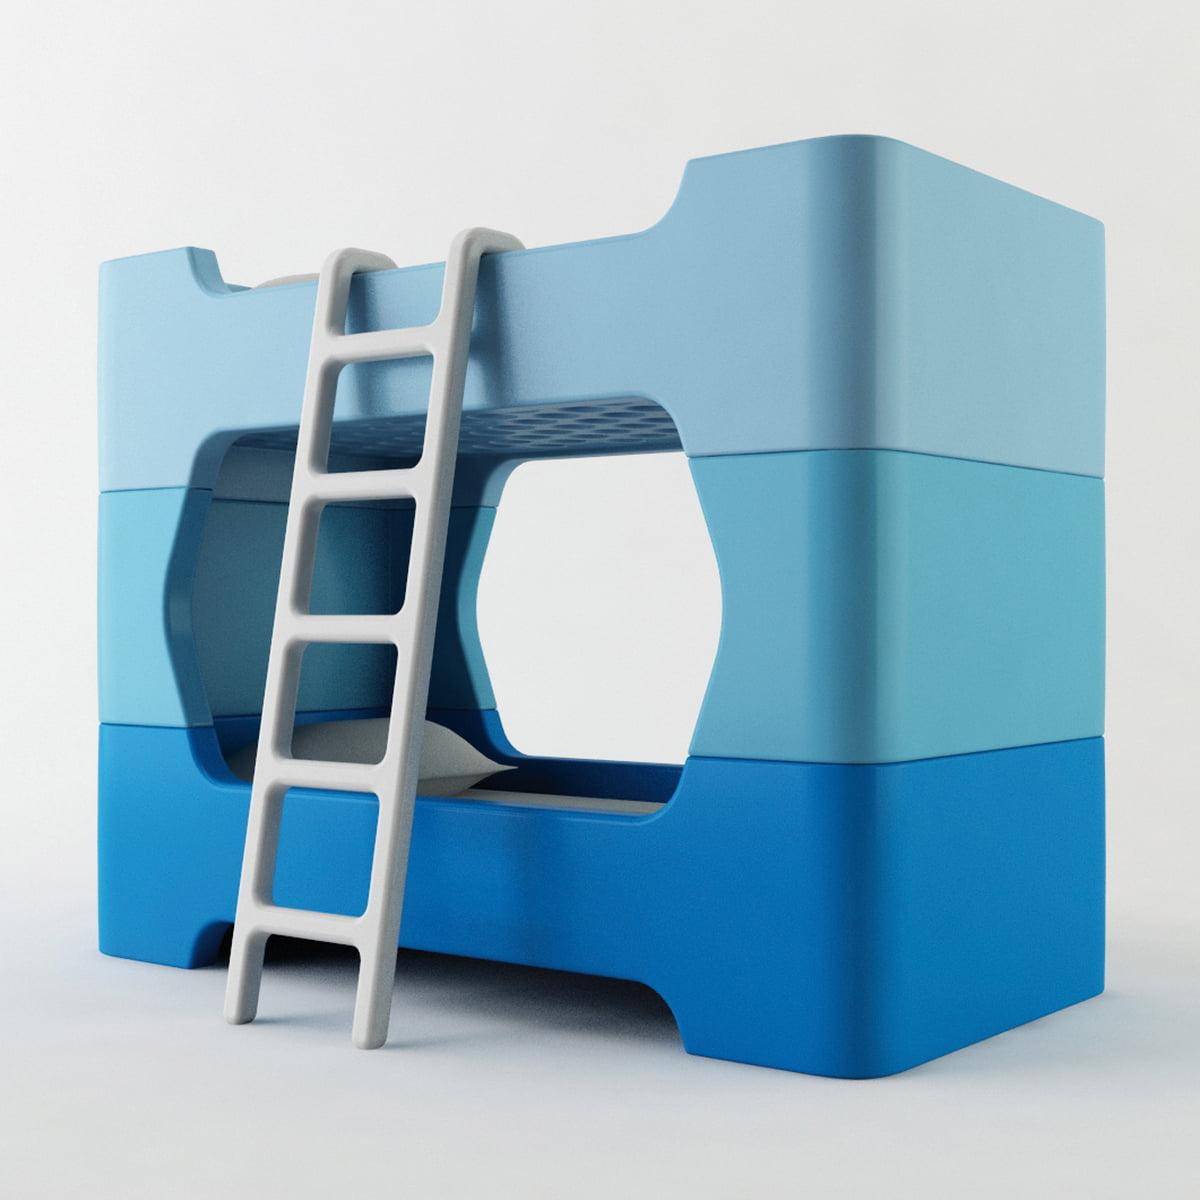 Kinderbett designklassiker  Bunky Kinderbett | Magis Me Too | Shop